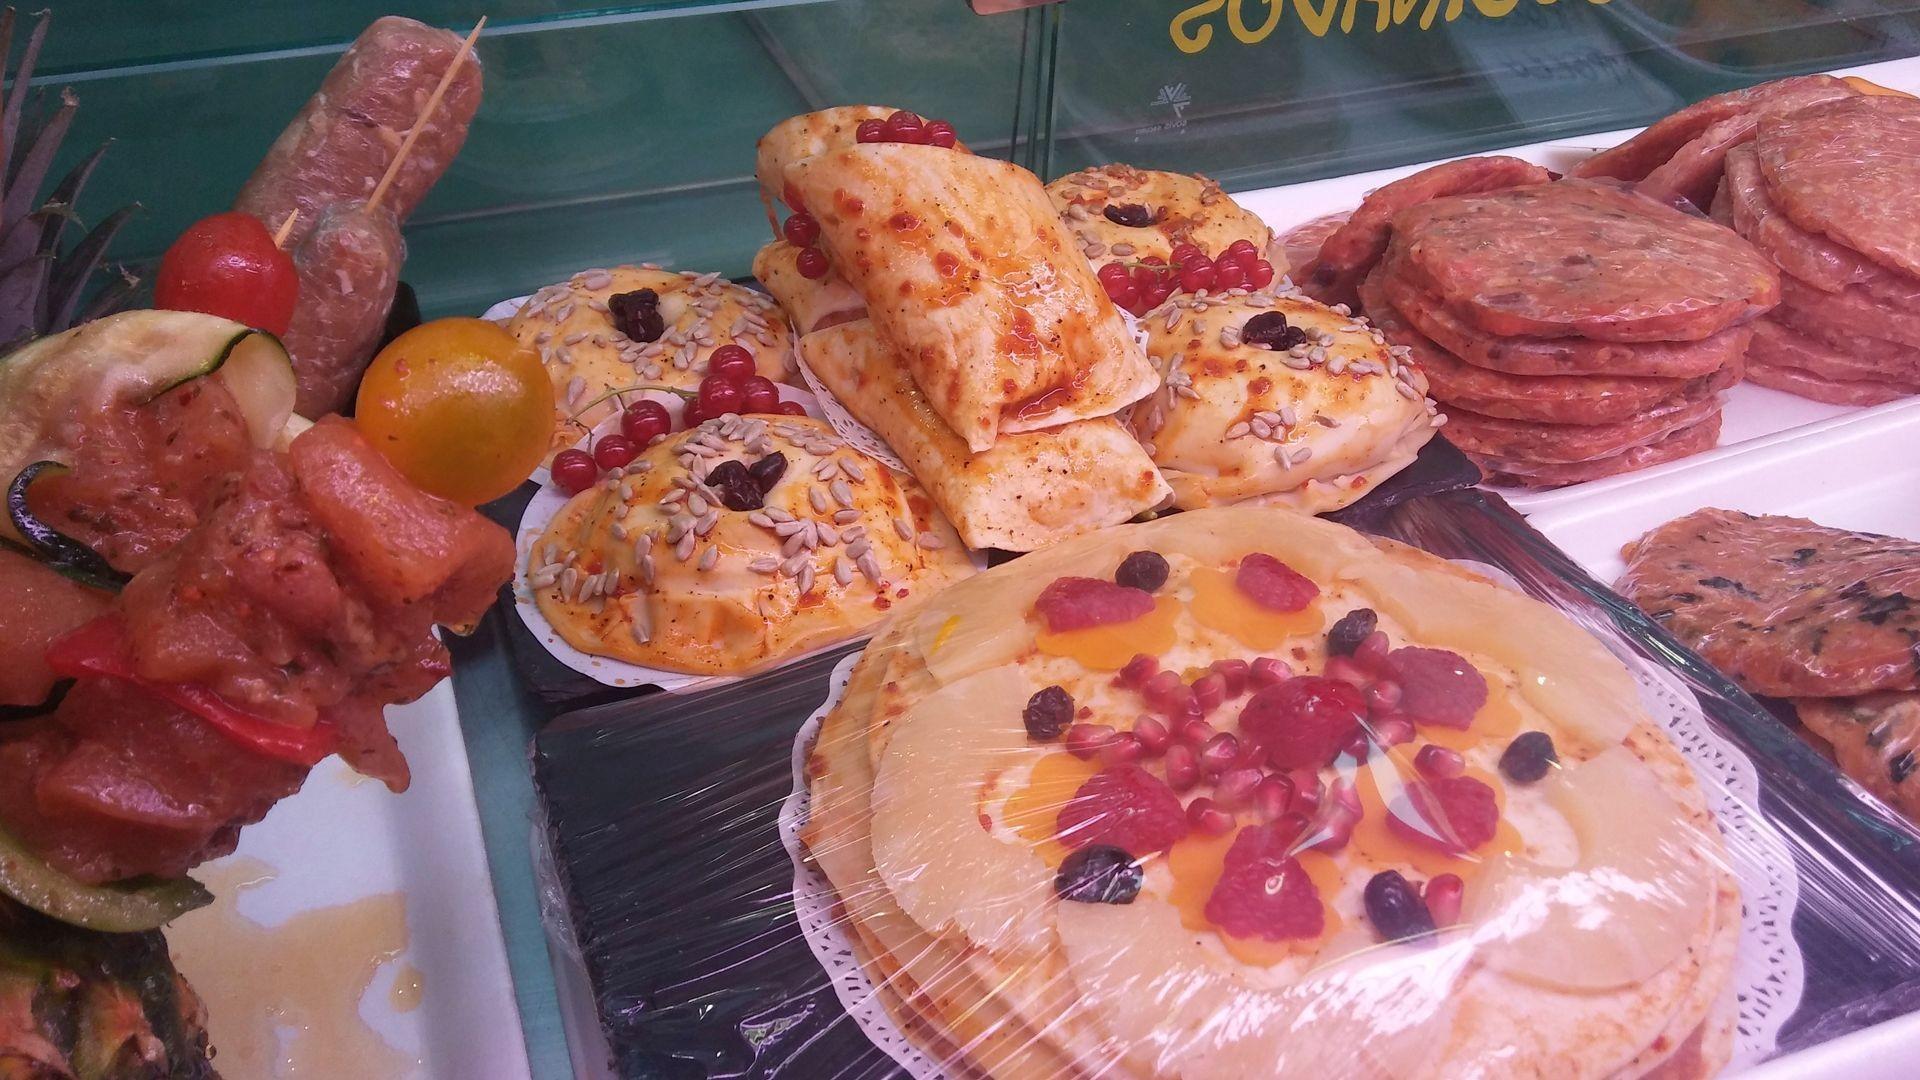 Pastelería cárnica en A Coruña